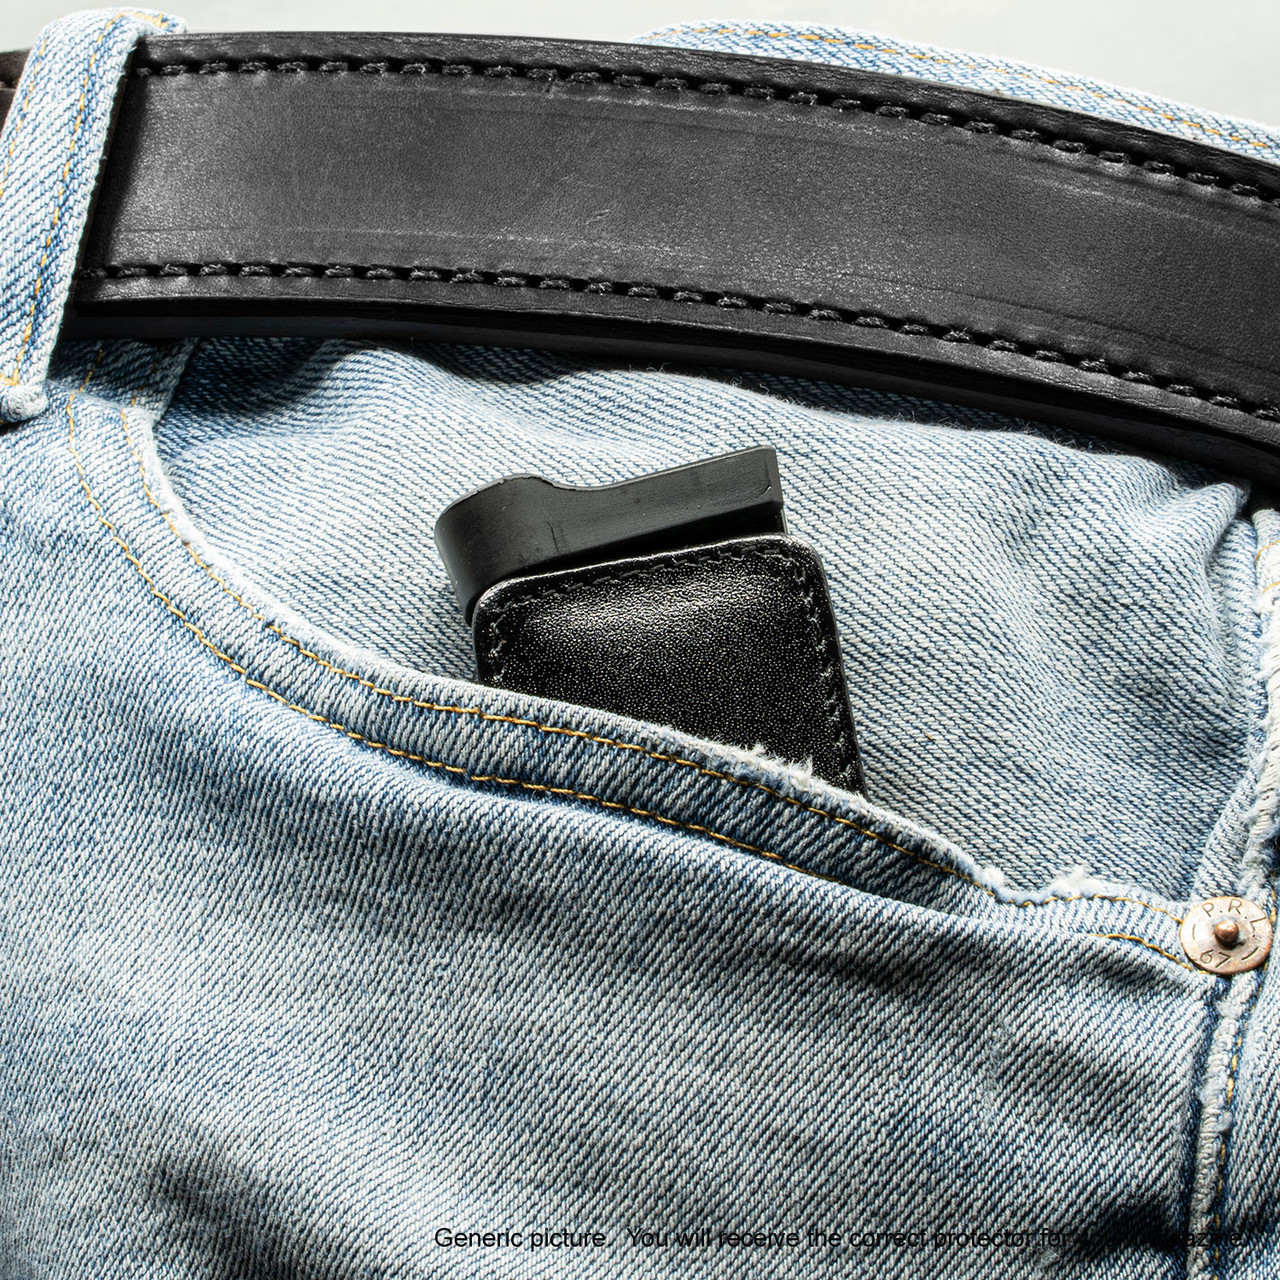 Kahr CW45 Black Leather Magazine Pocket Protector